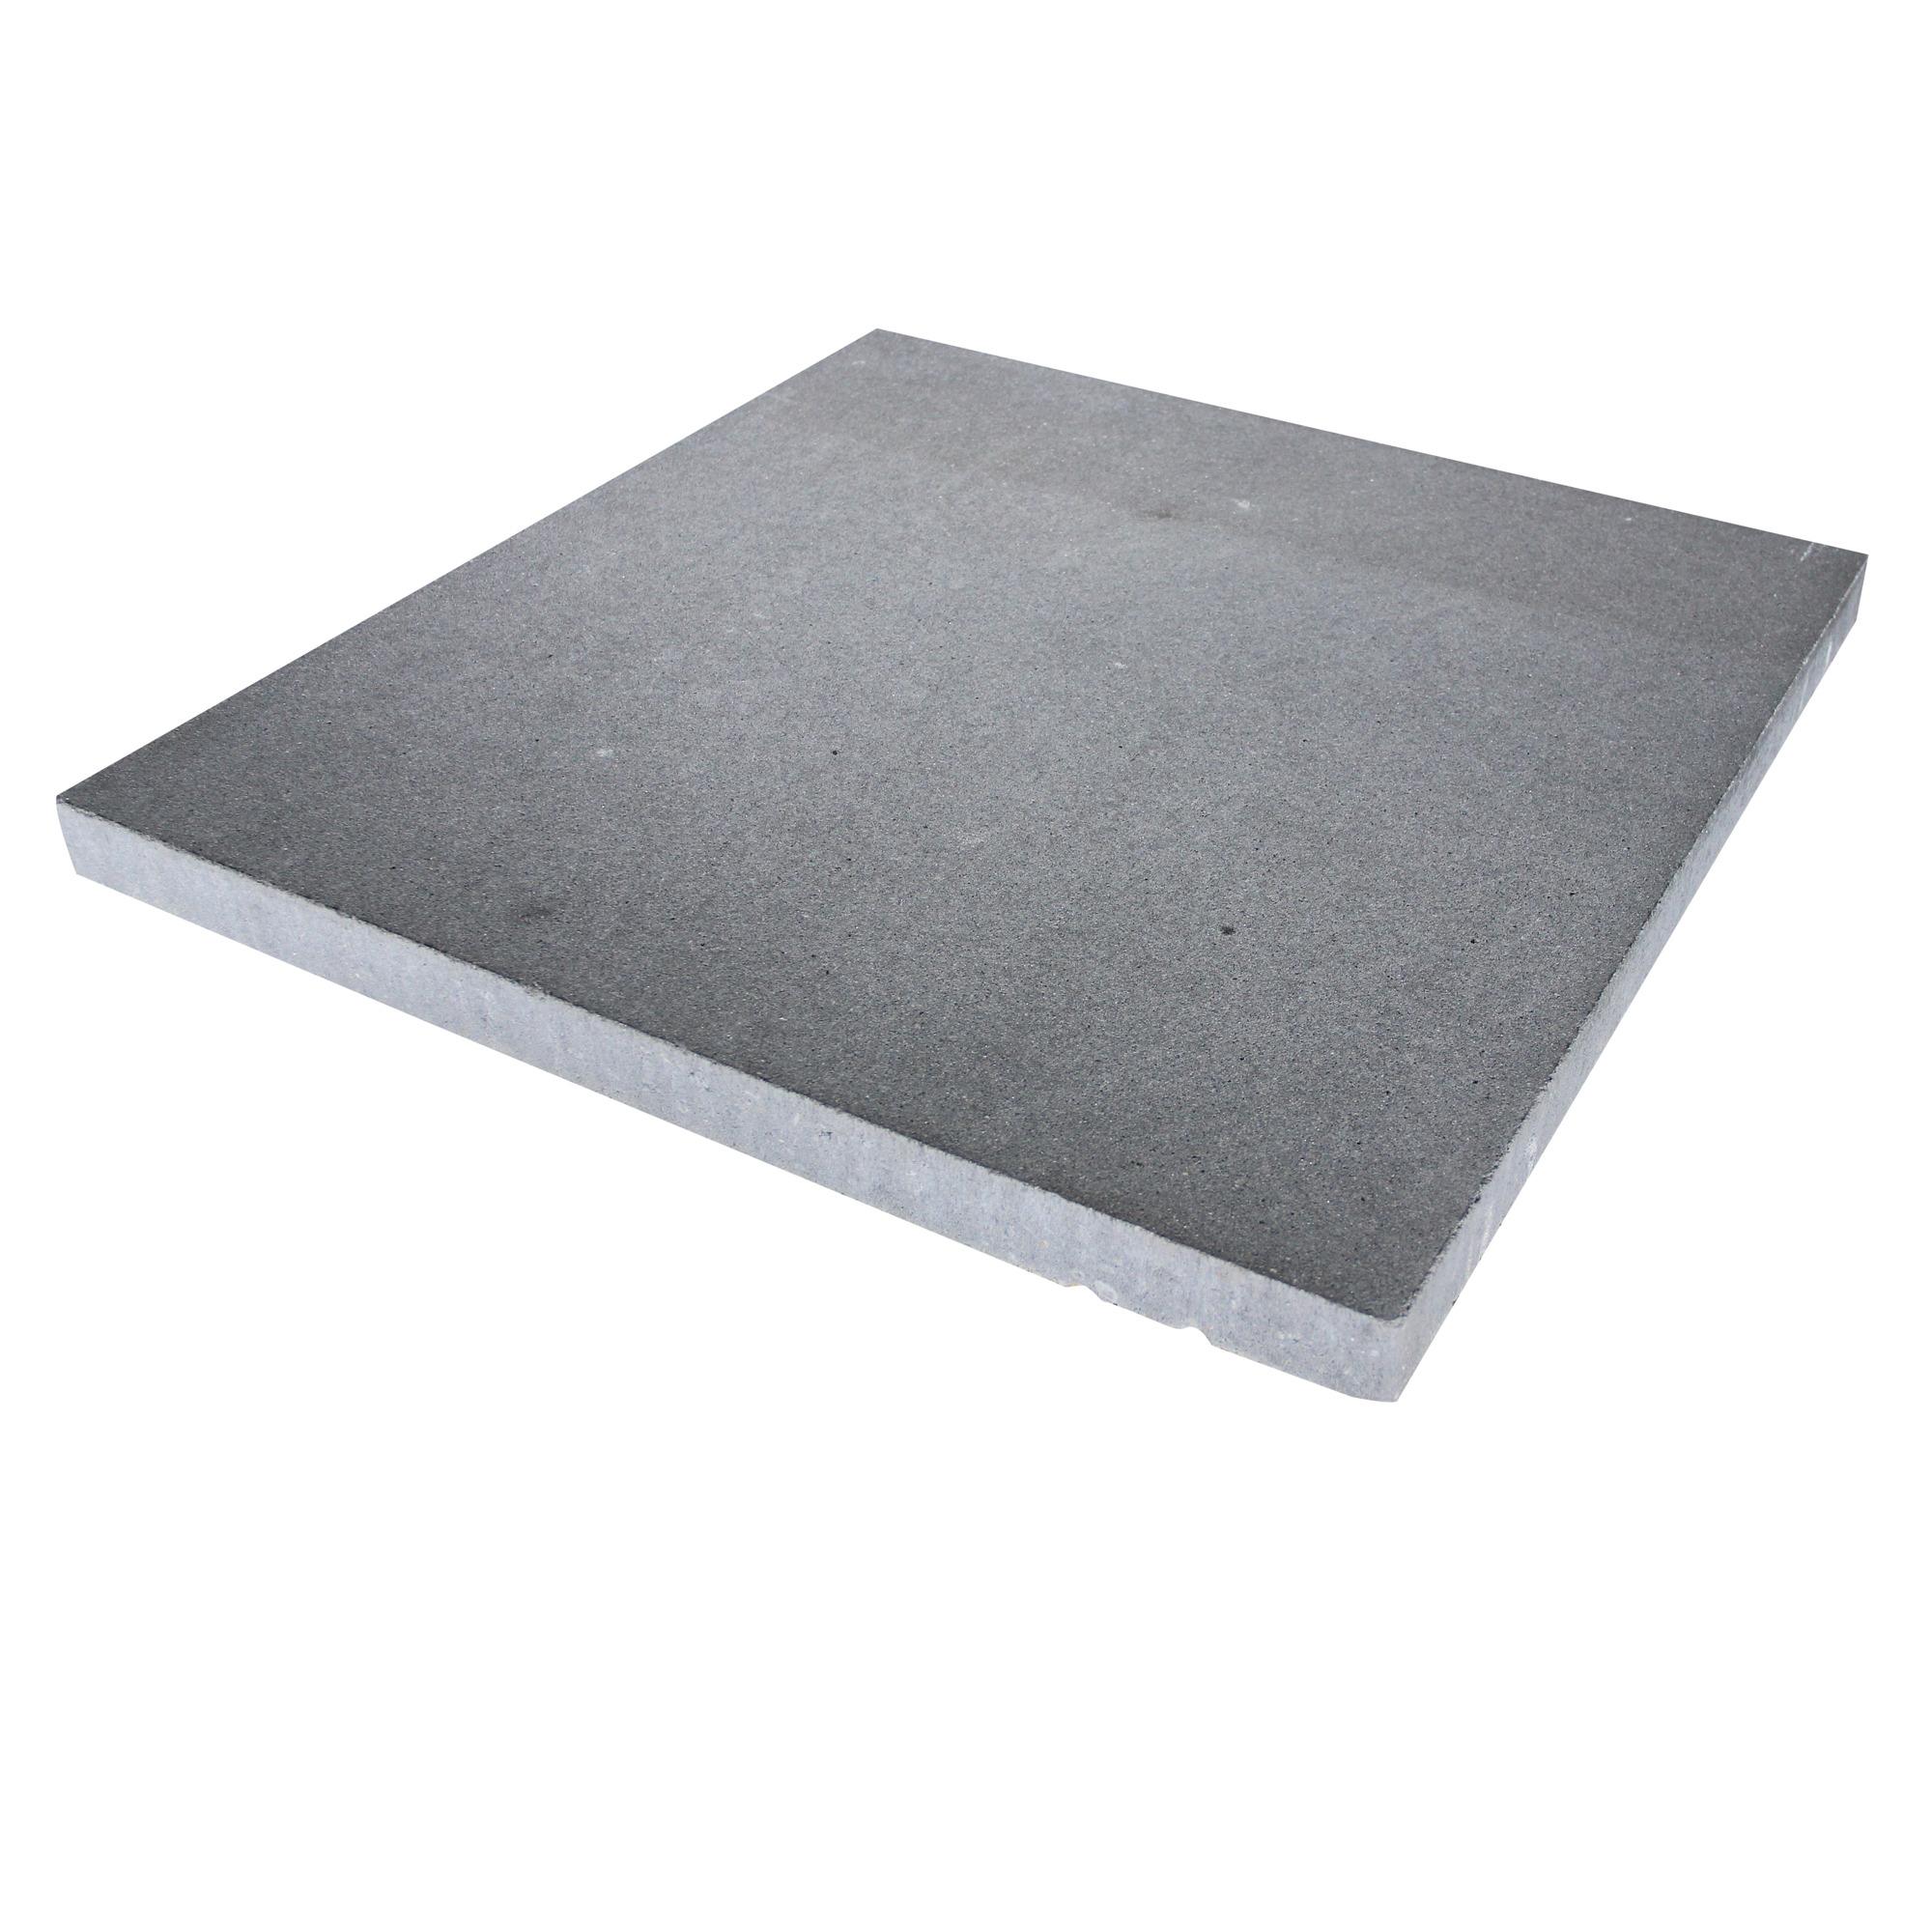 Terrastegel Beton Vegas Zwart Nuance 60x60 cm Per Tegel-0,36 m2